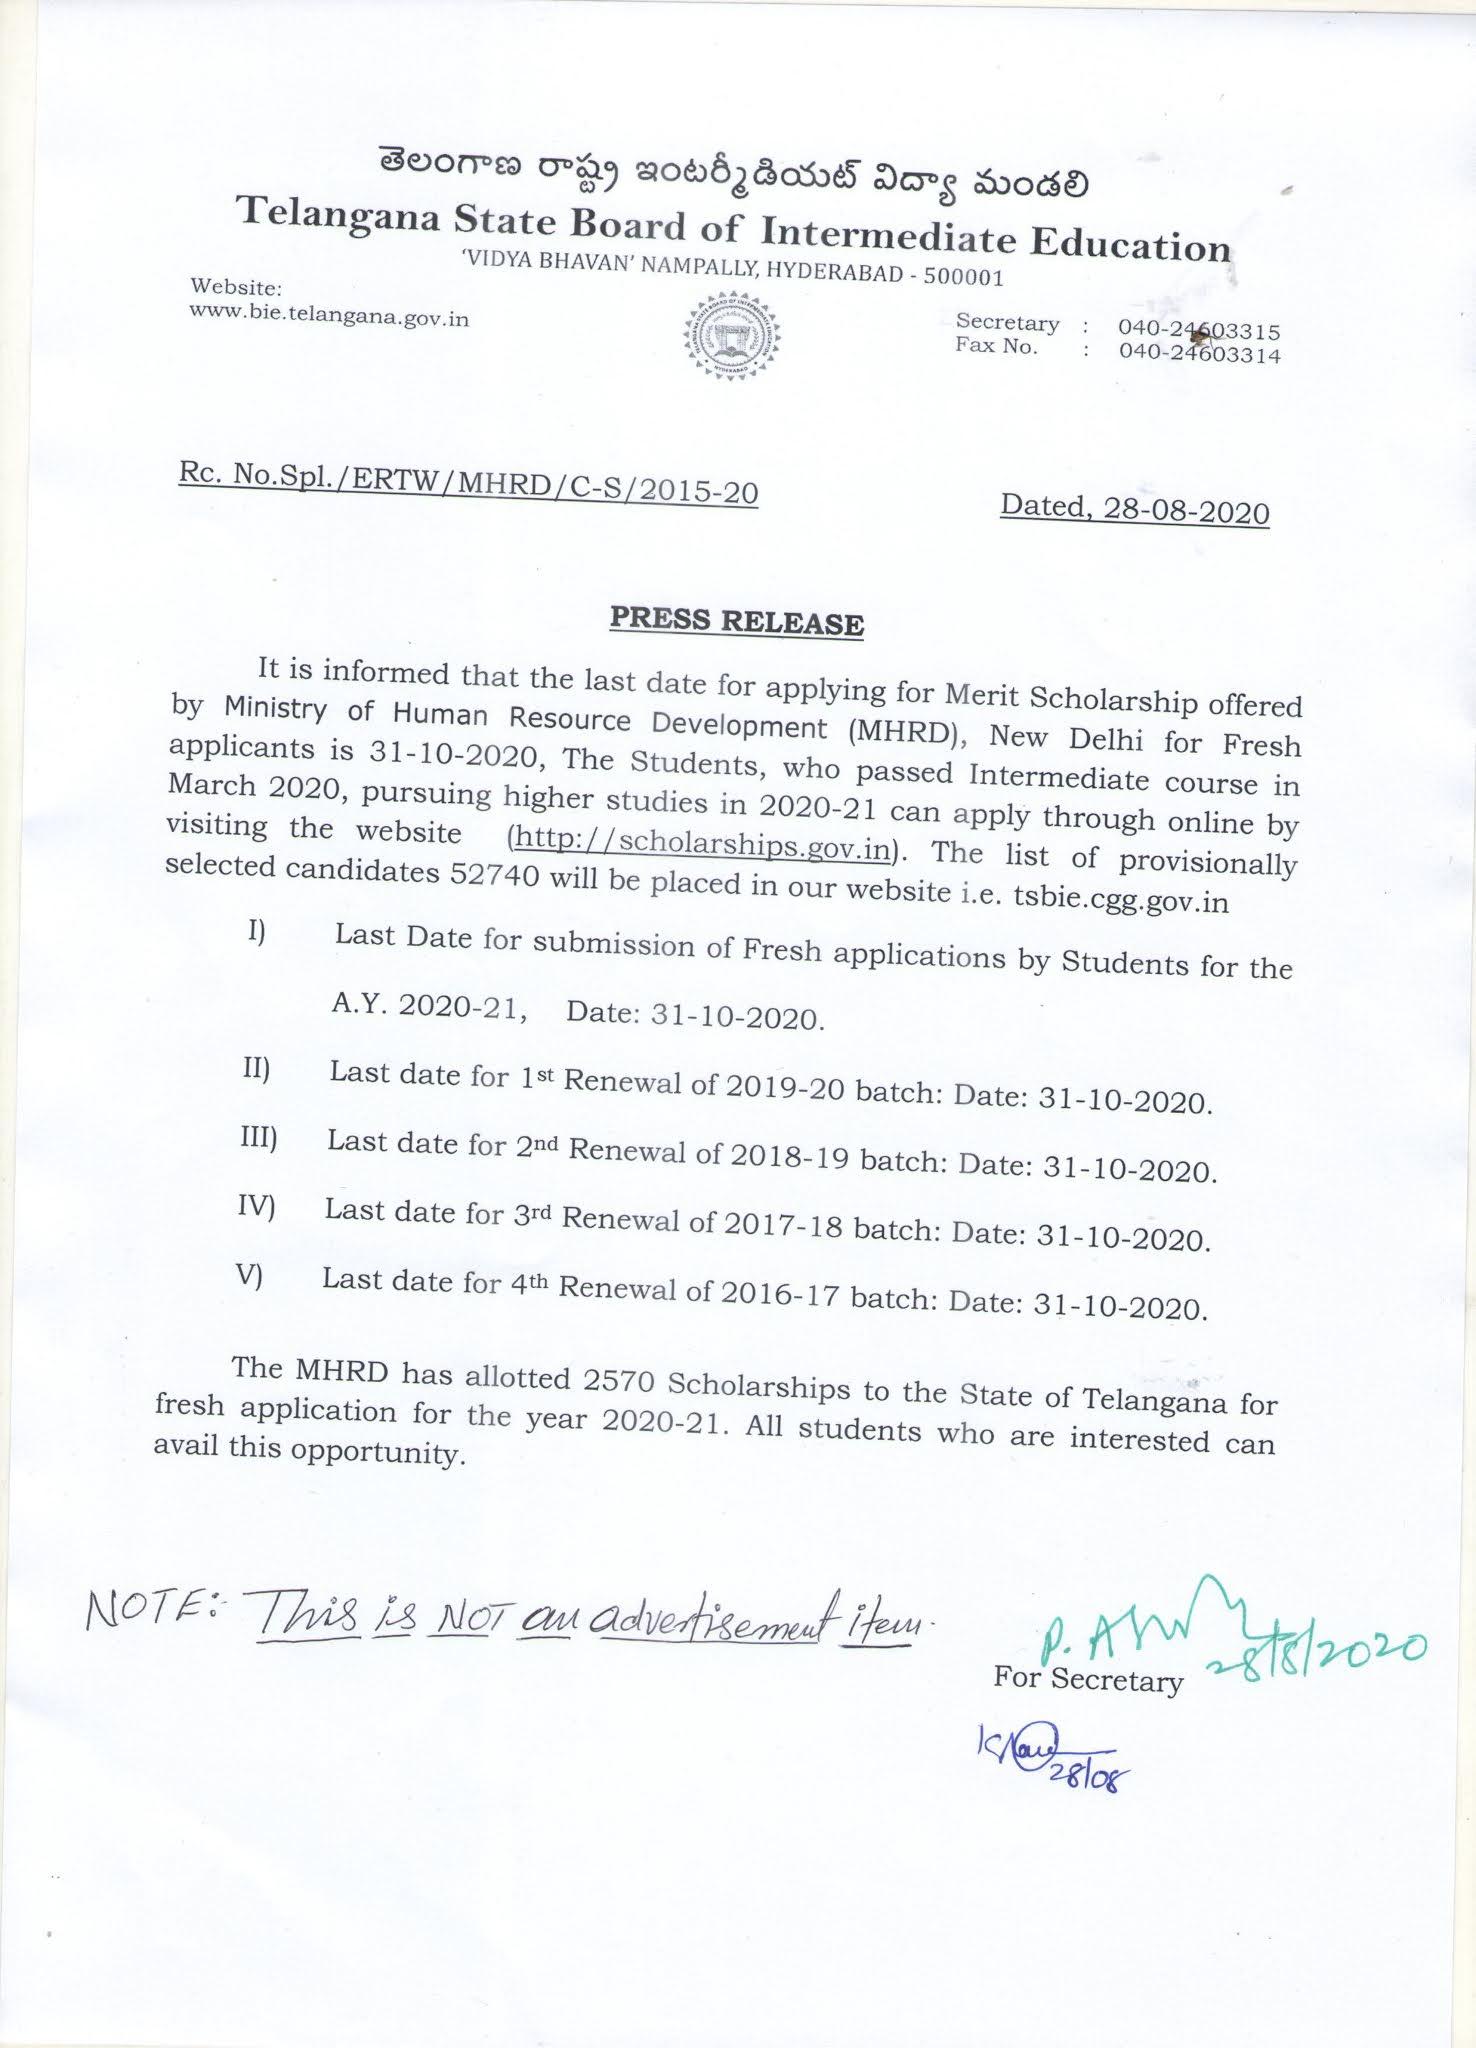 TS Inter Board MHRD Merit Scholarship Applying For Last Date Press Release